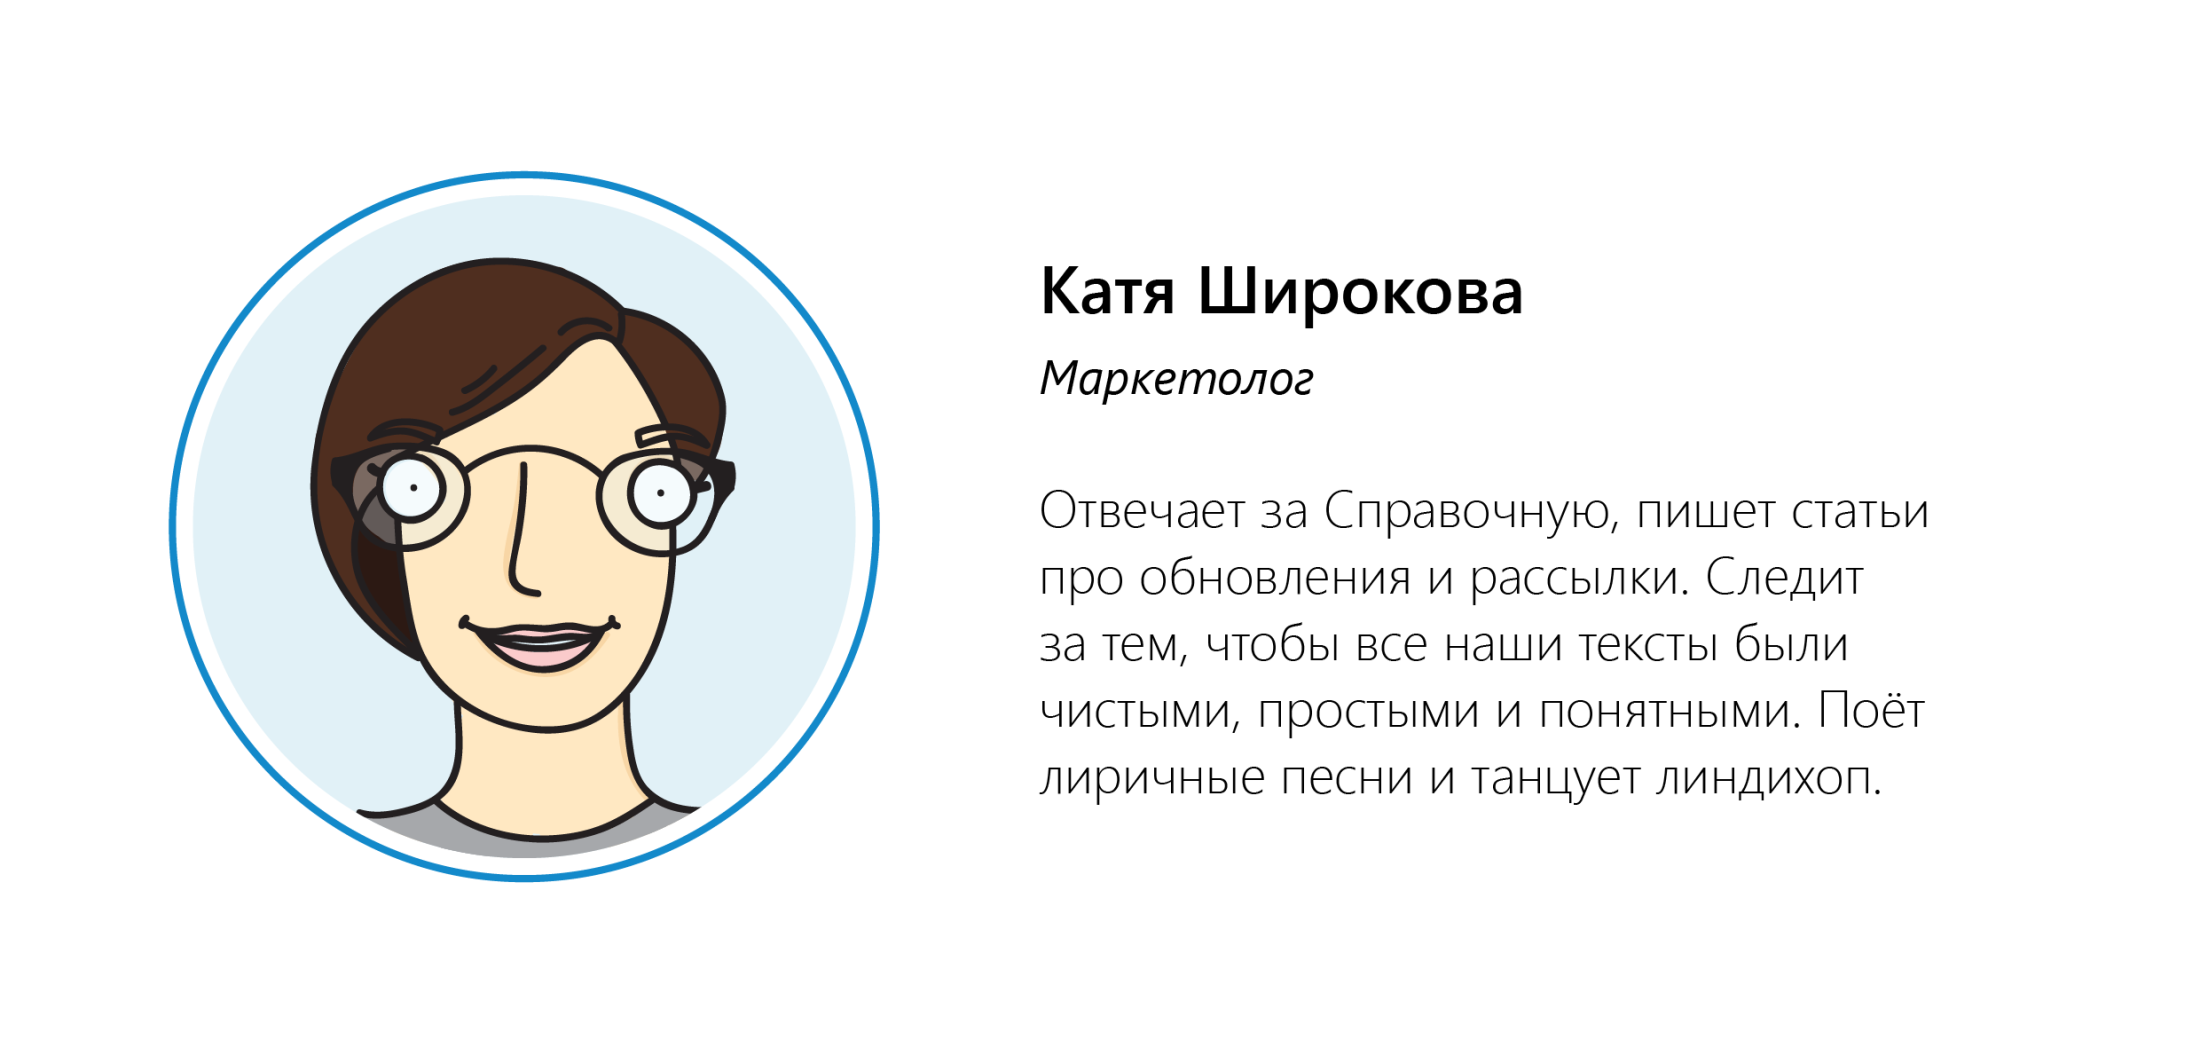 Катя Широкова